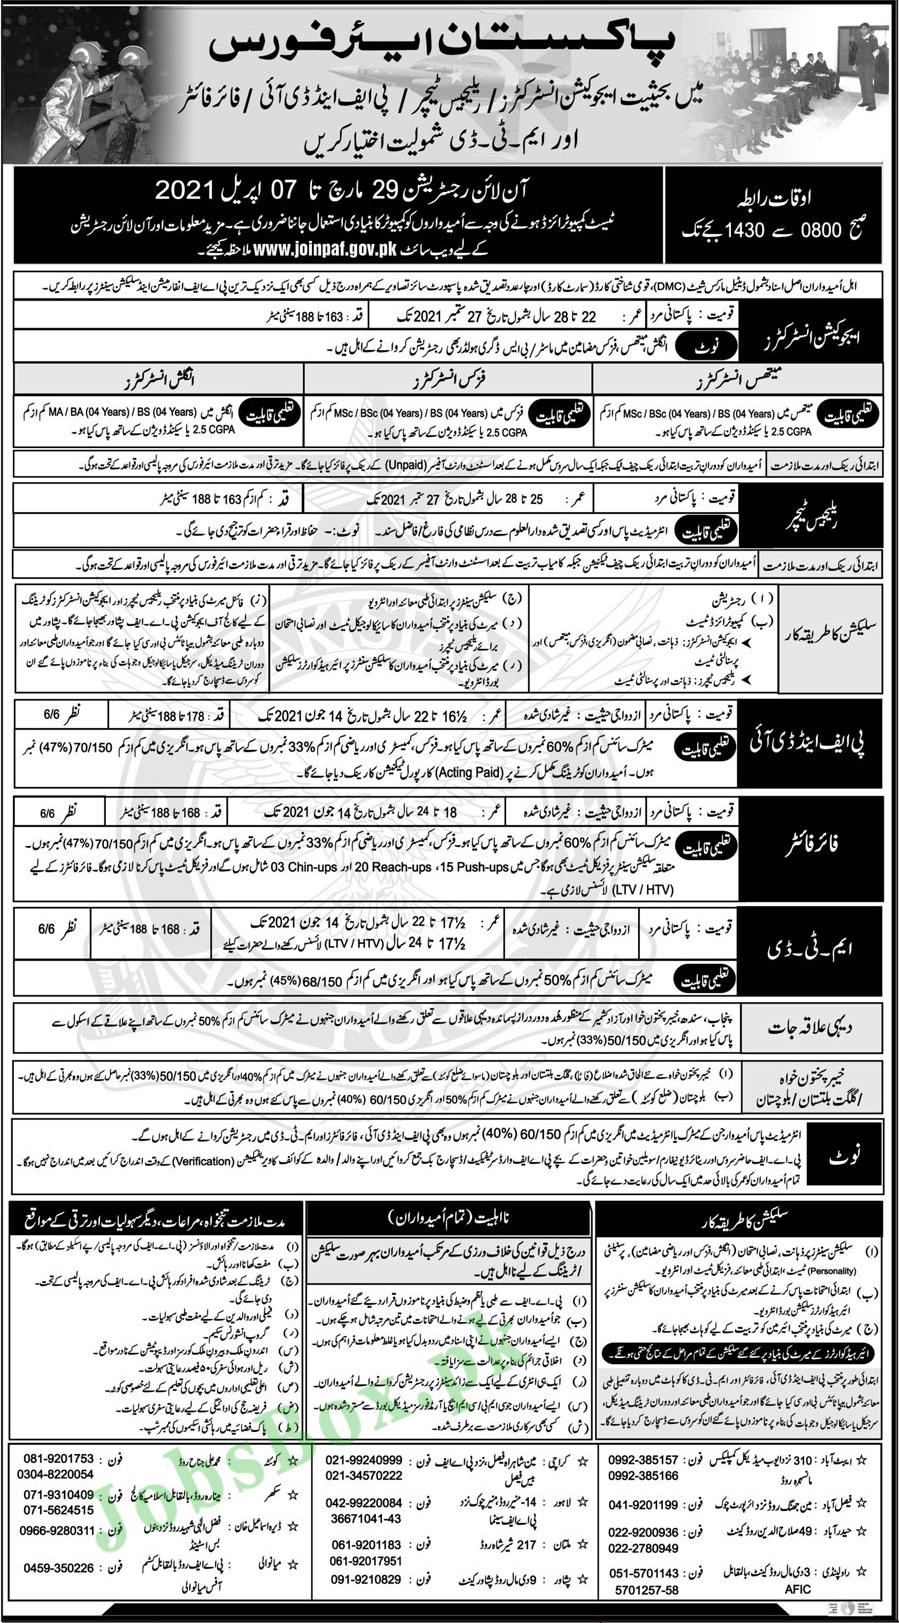 Pakistan Air Force Jobs 2021 advertisement